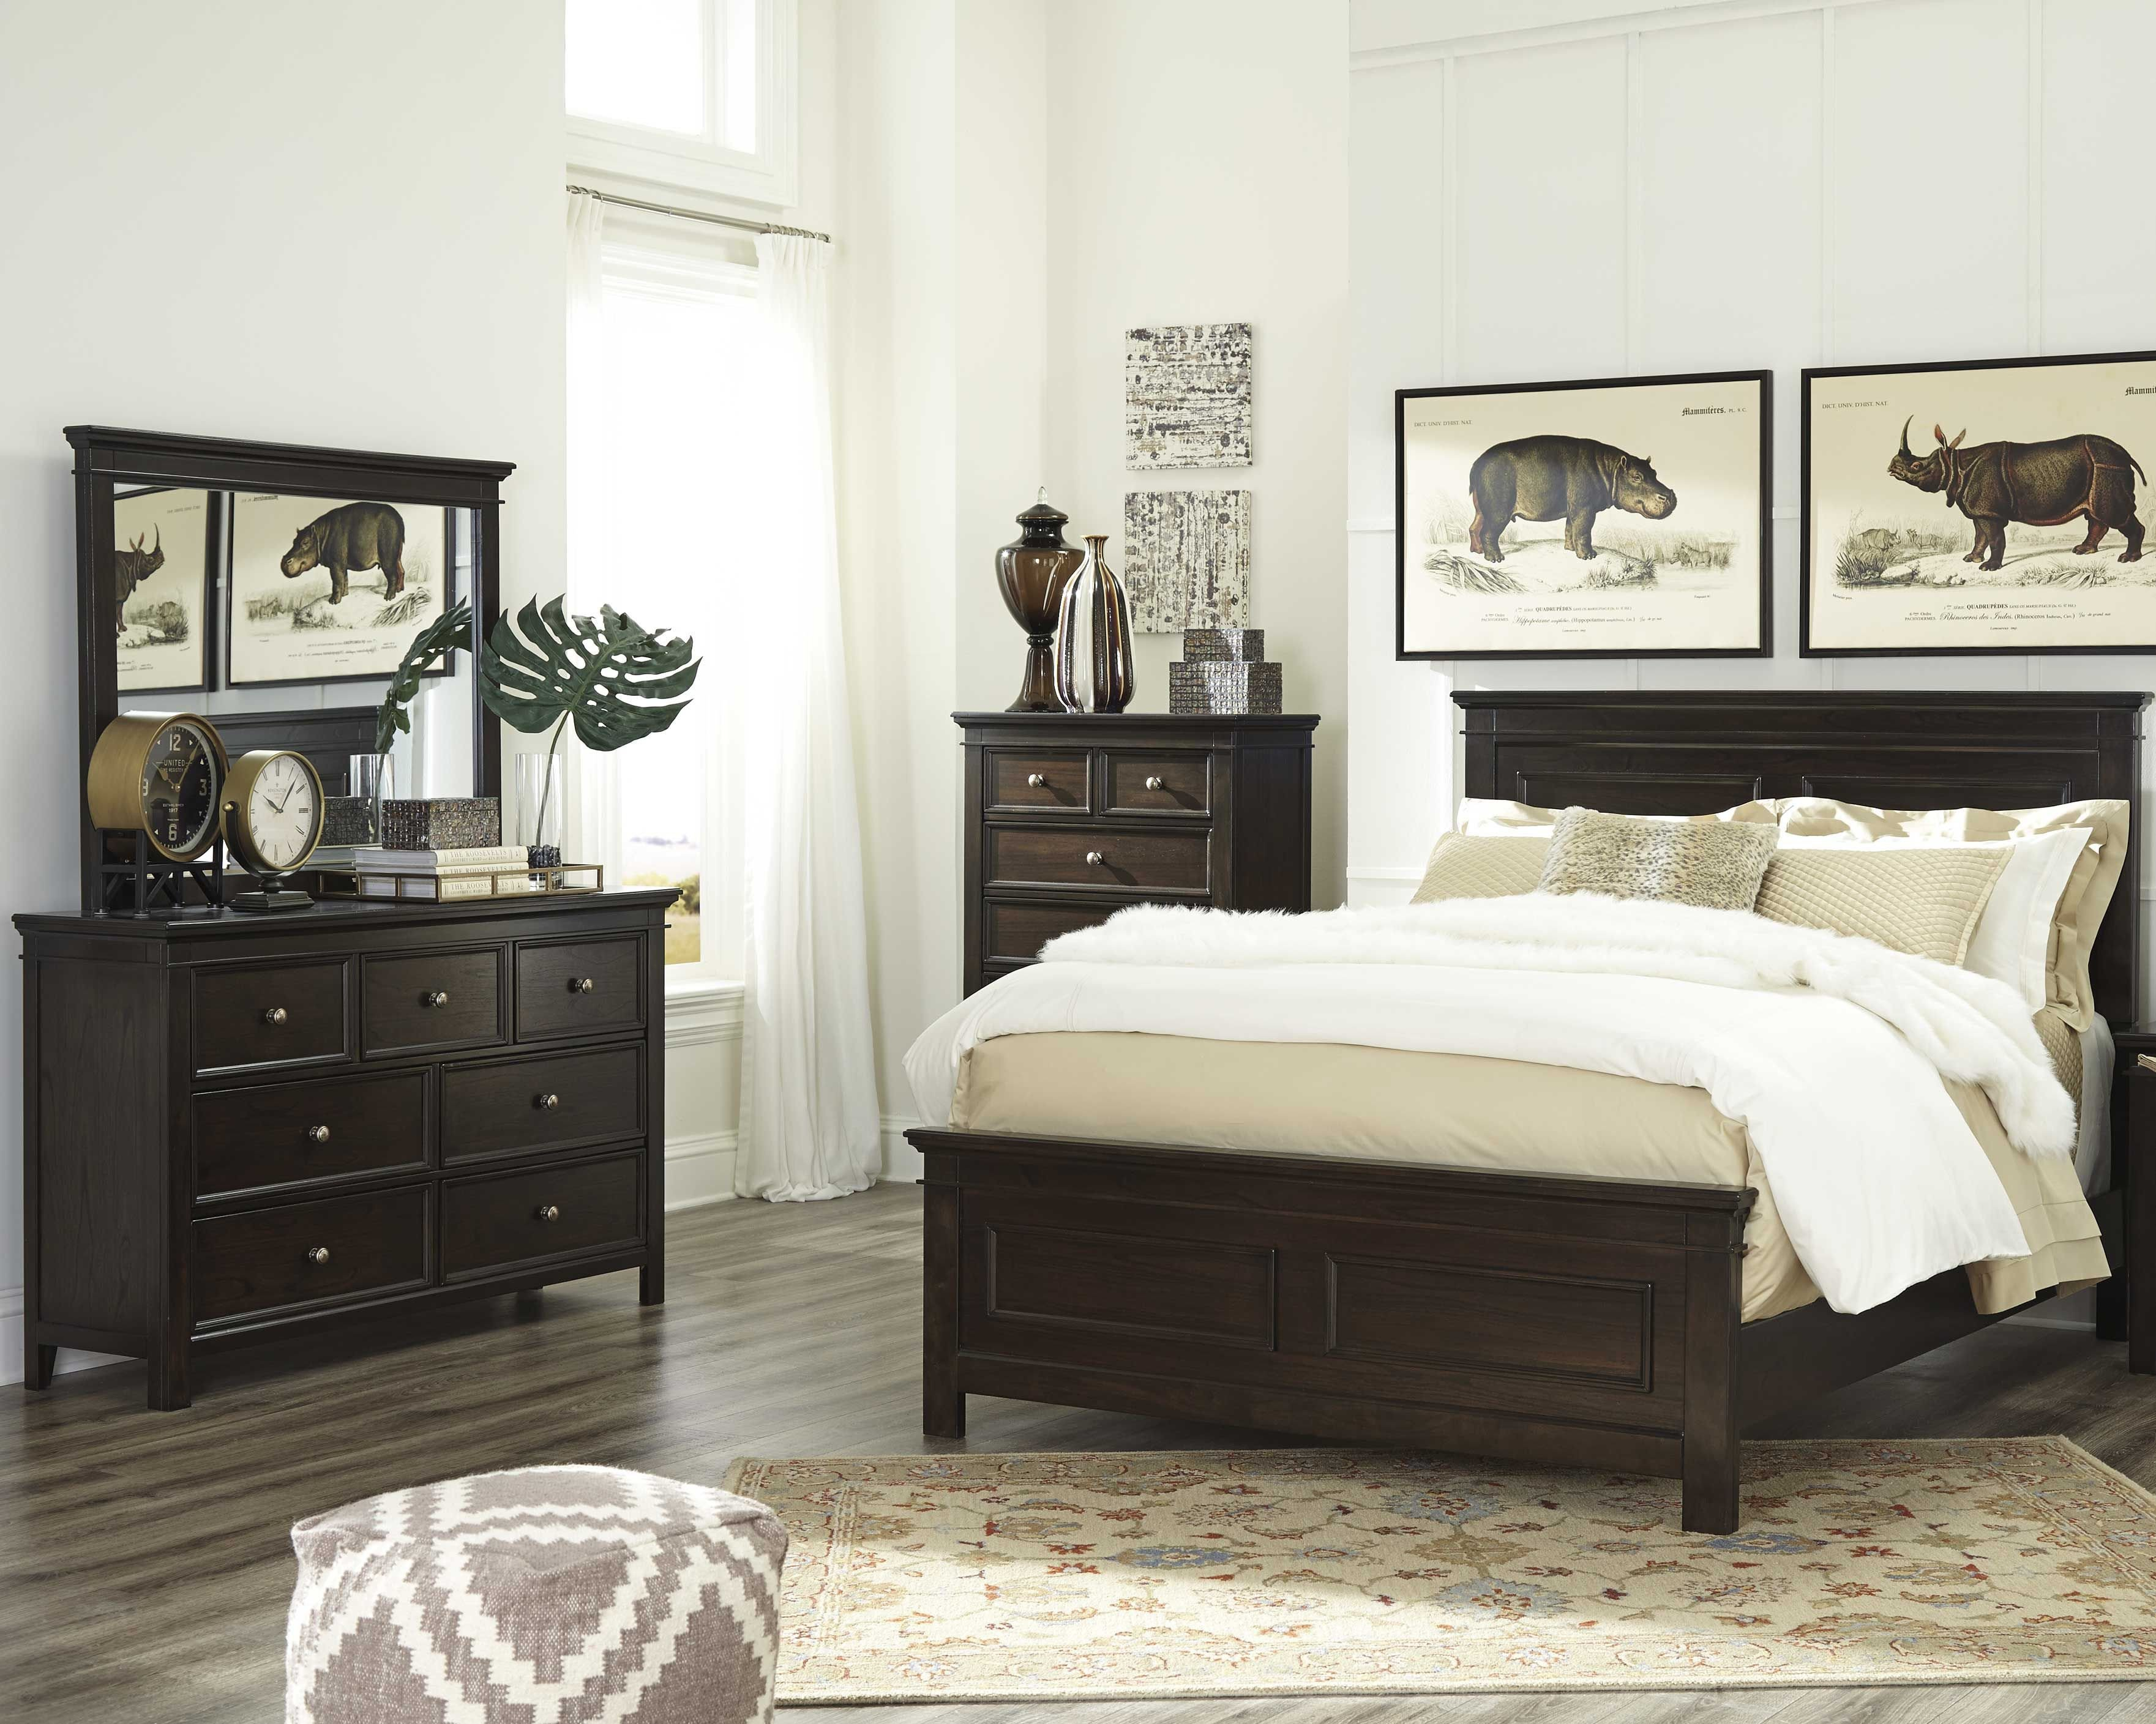 Ashley White Bedroom Set Elegant Alexee 5 Piece King Bedroom Dark Brown